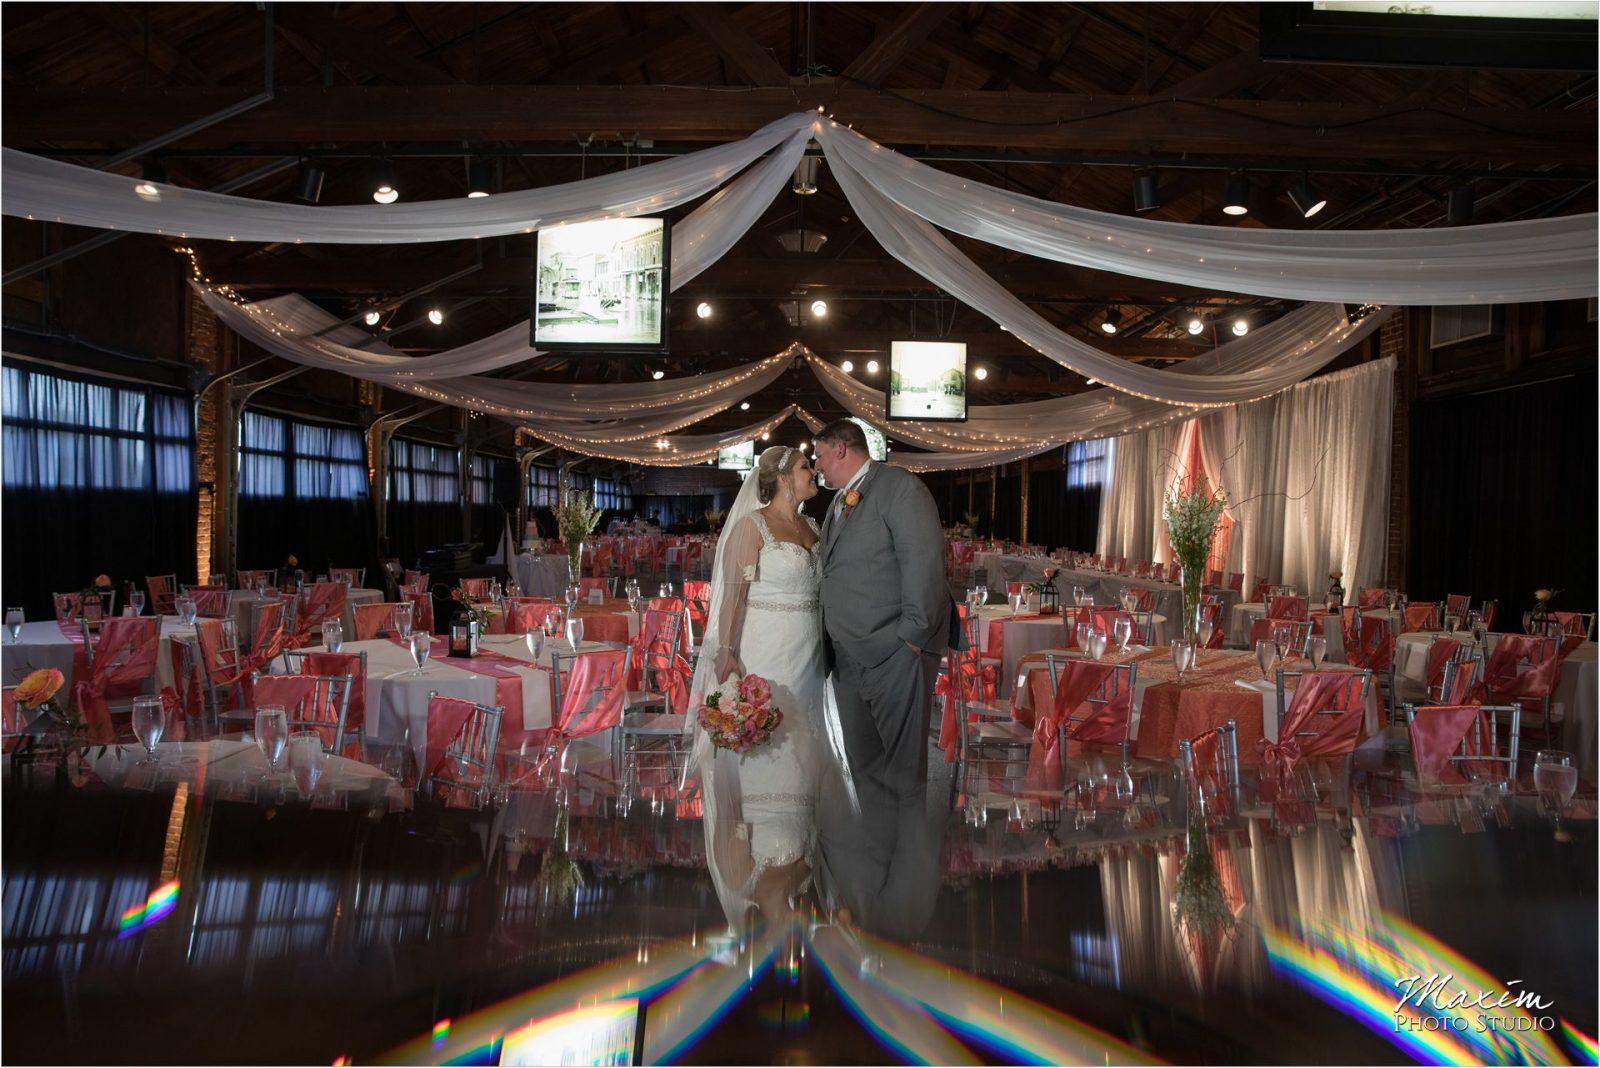 Top of the Market Dayton Ohio Wedding Reception